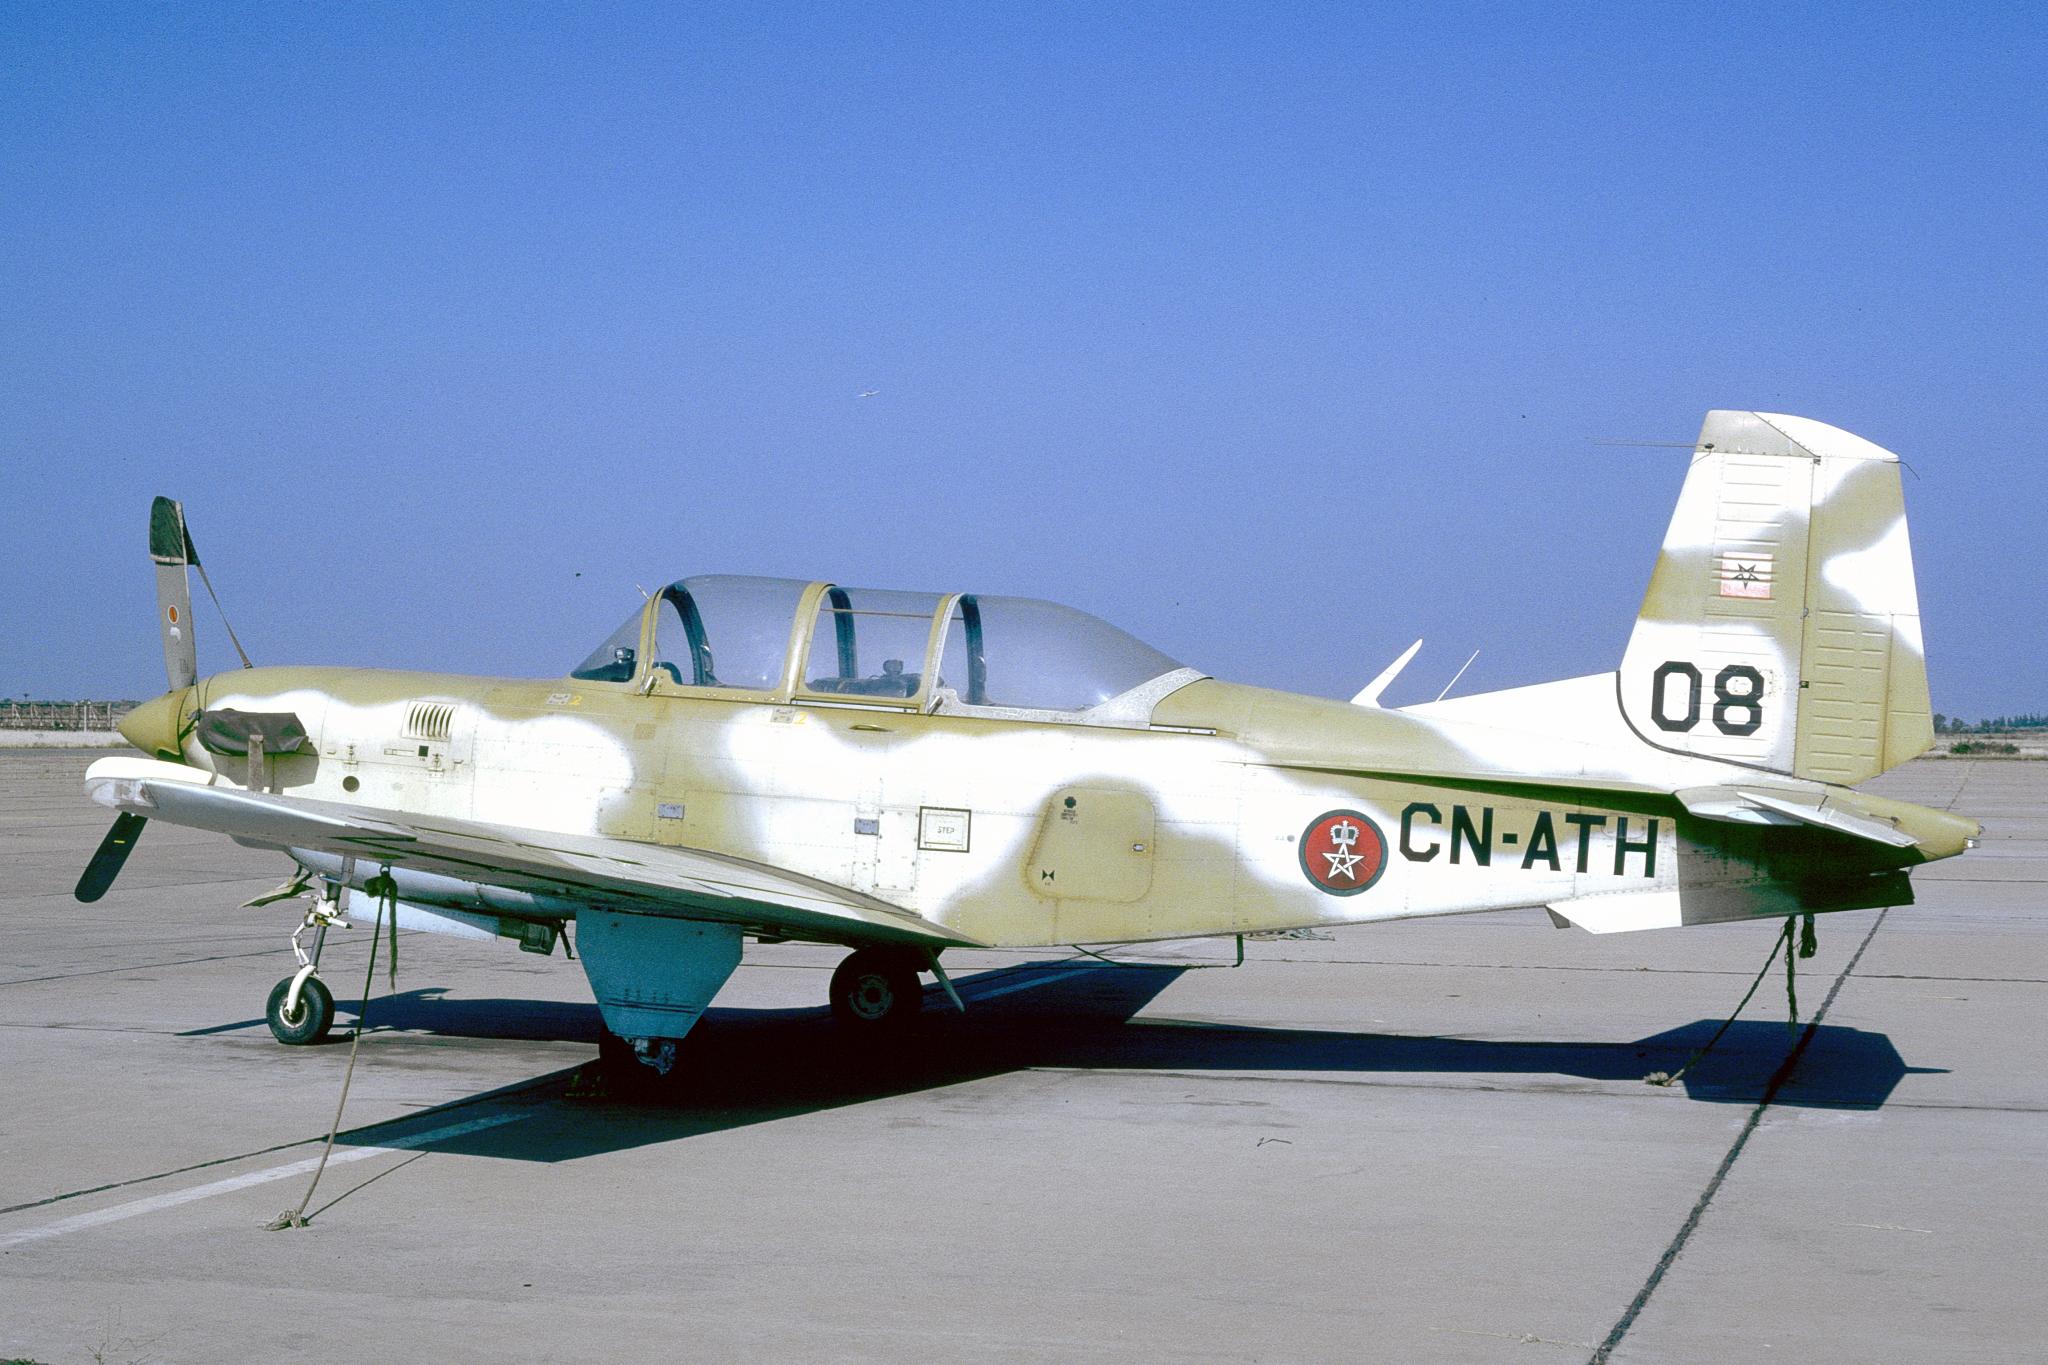 FRA: Photos anciens avions des FRA - Page 12 46140024405_d07113ea66_o